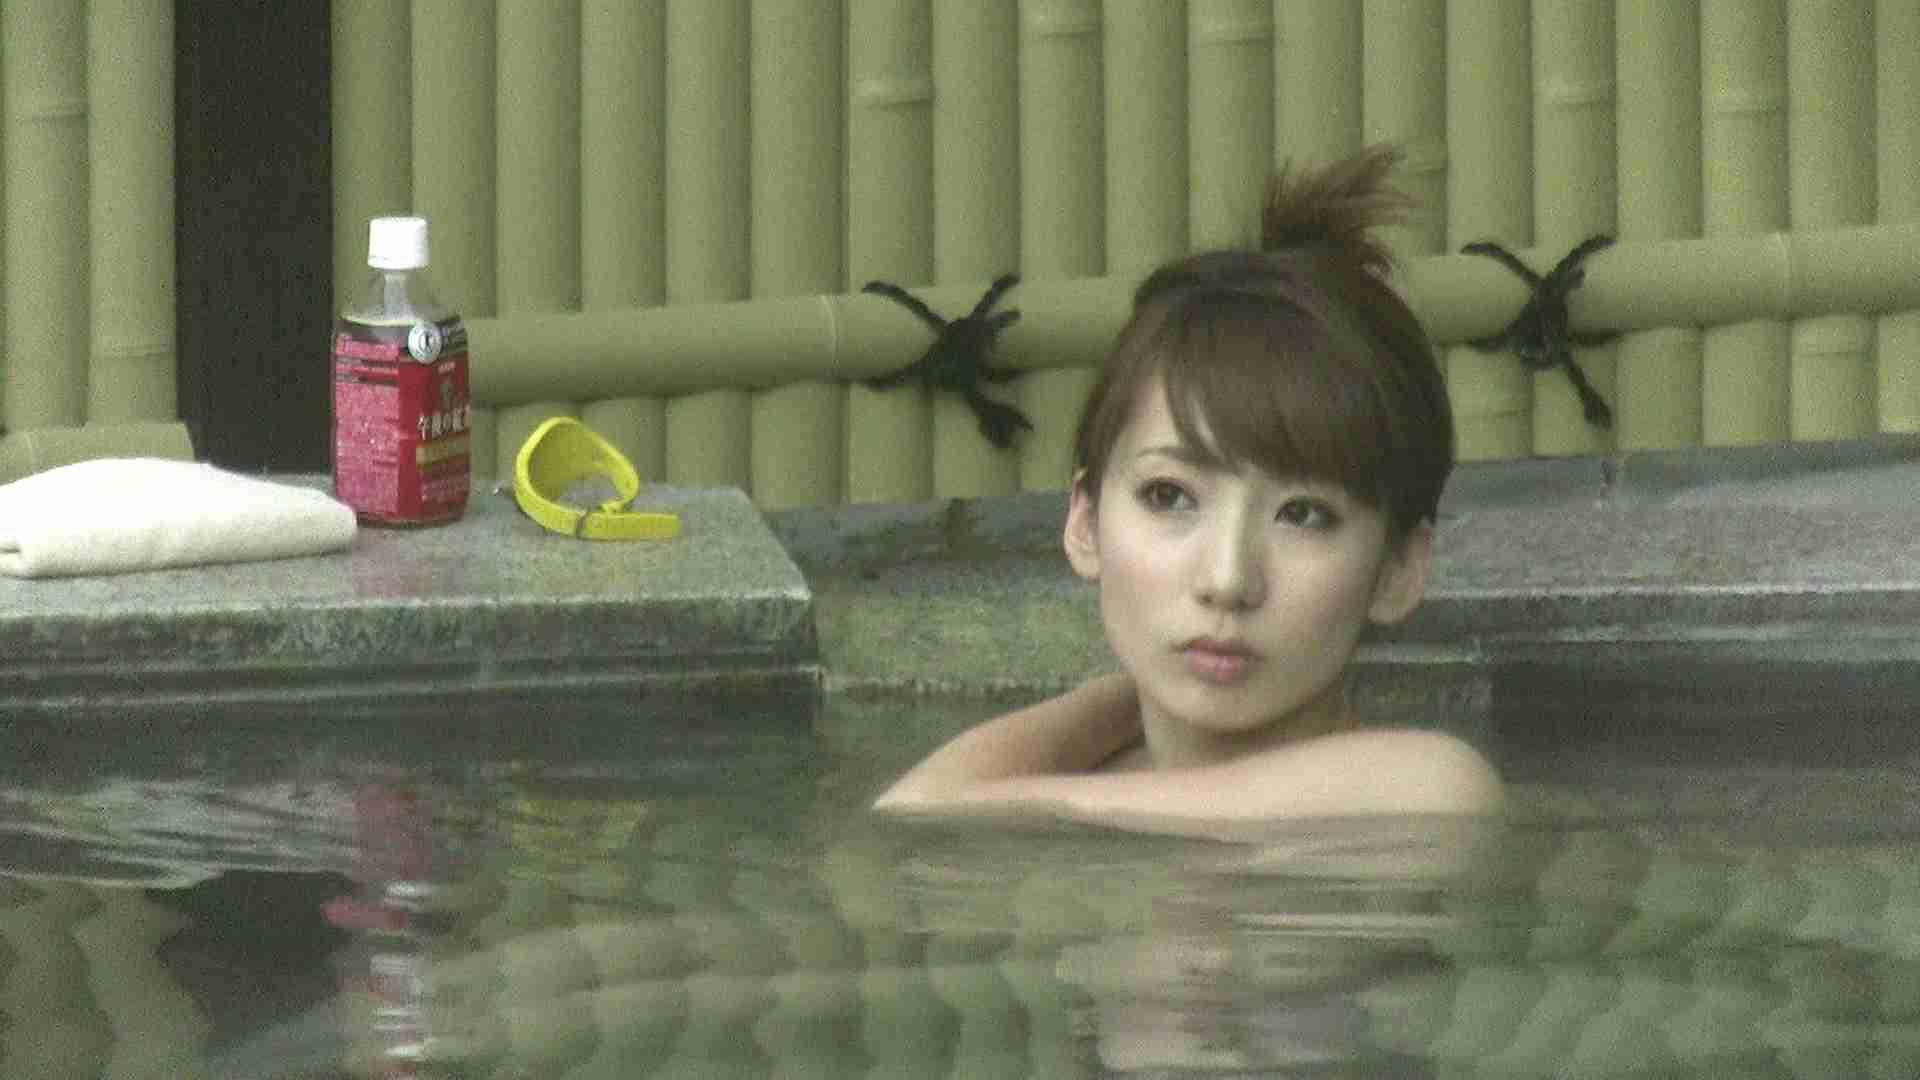 Aquaな露天風呂Vol.208 HなOL   盗撮  101pic 27